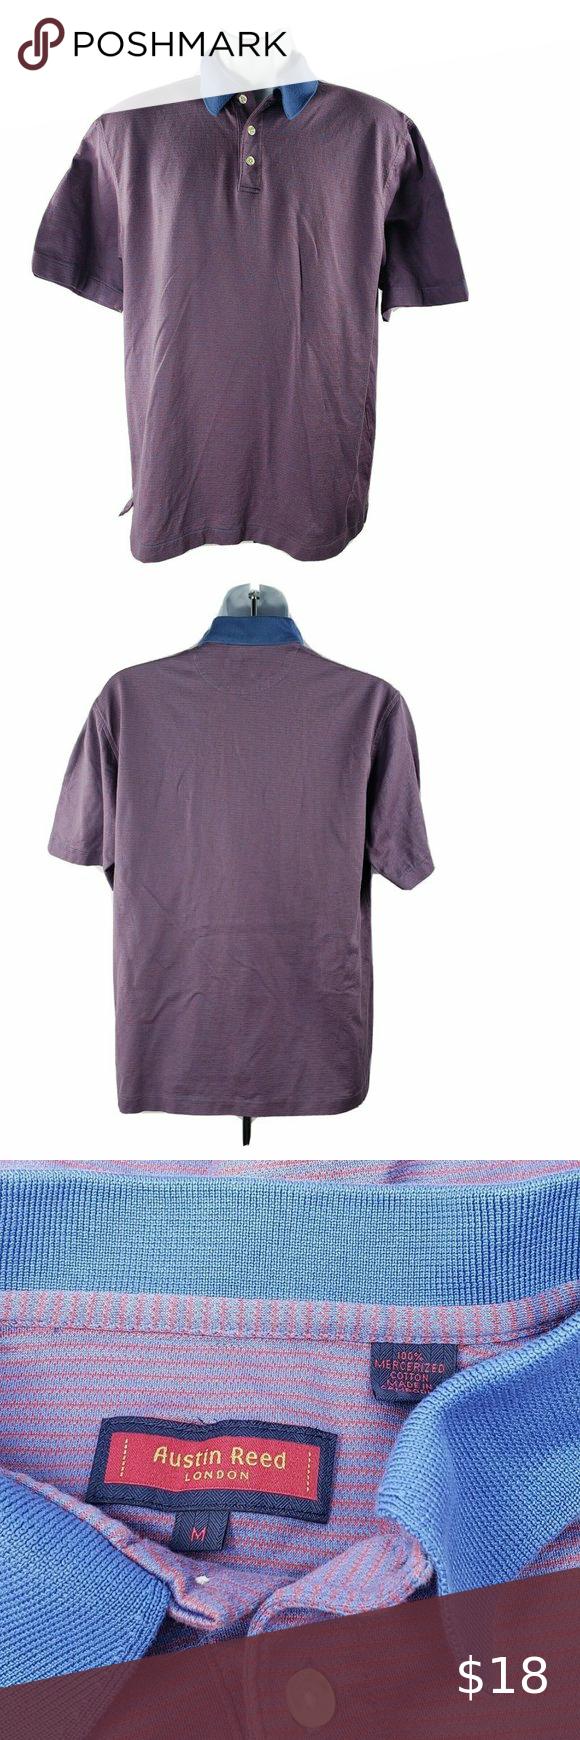 Austin Reed London Polo Golf Shirt M Stripes Golf Shirts Austin Reed Clothes Design